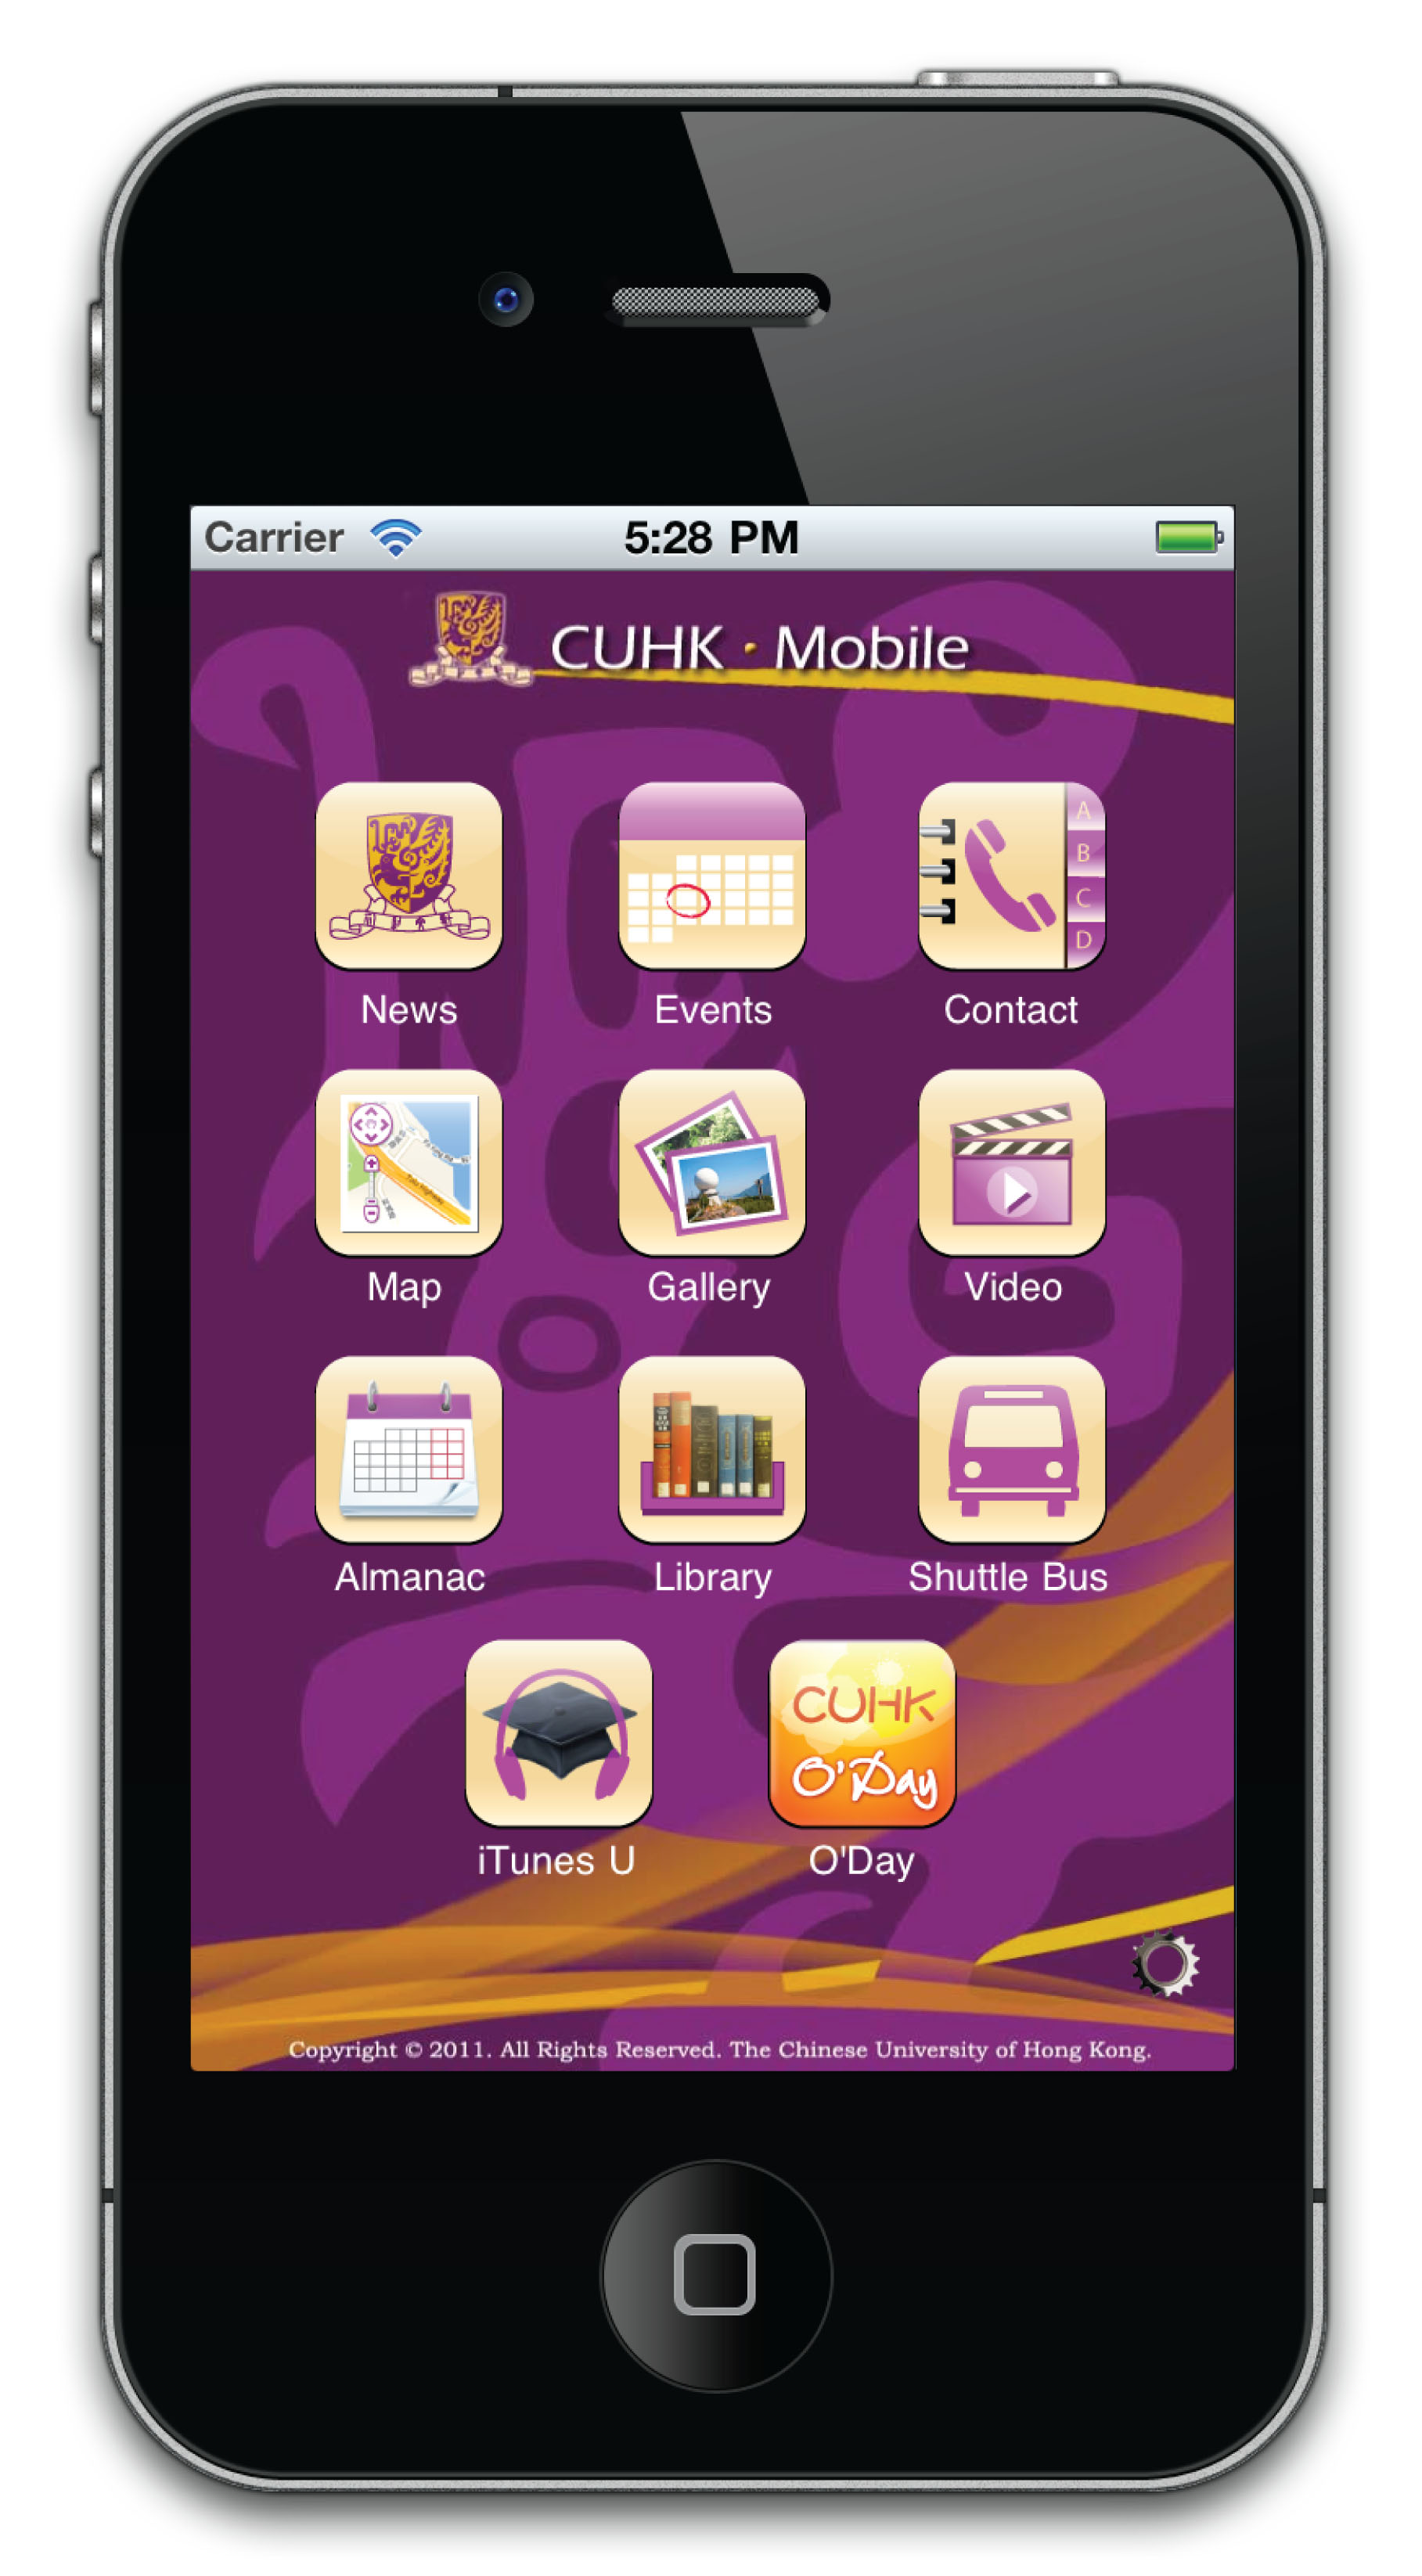 CUHK Mobile app